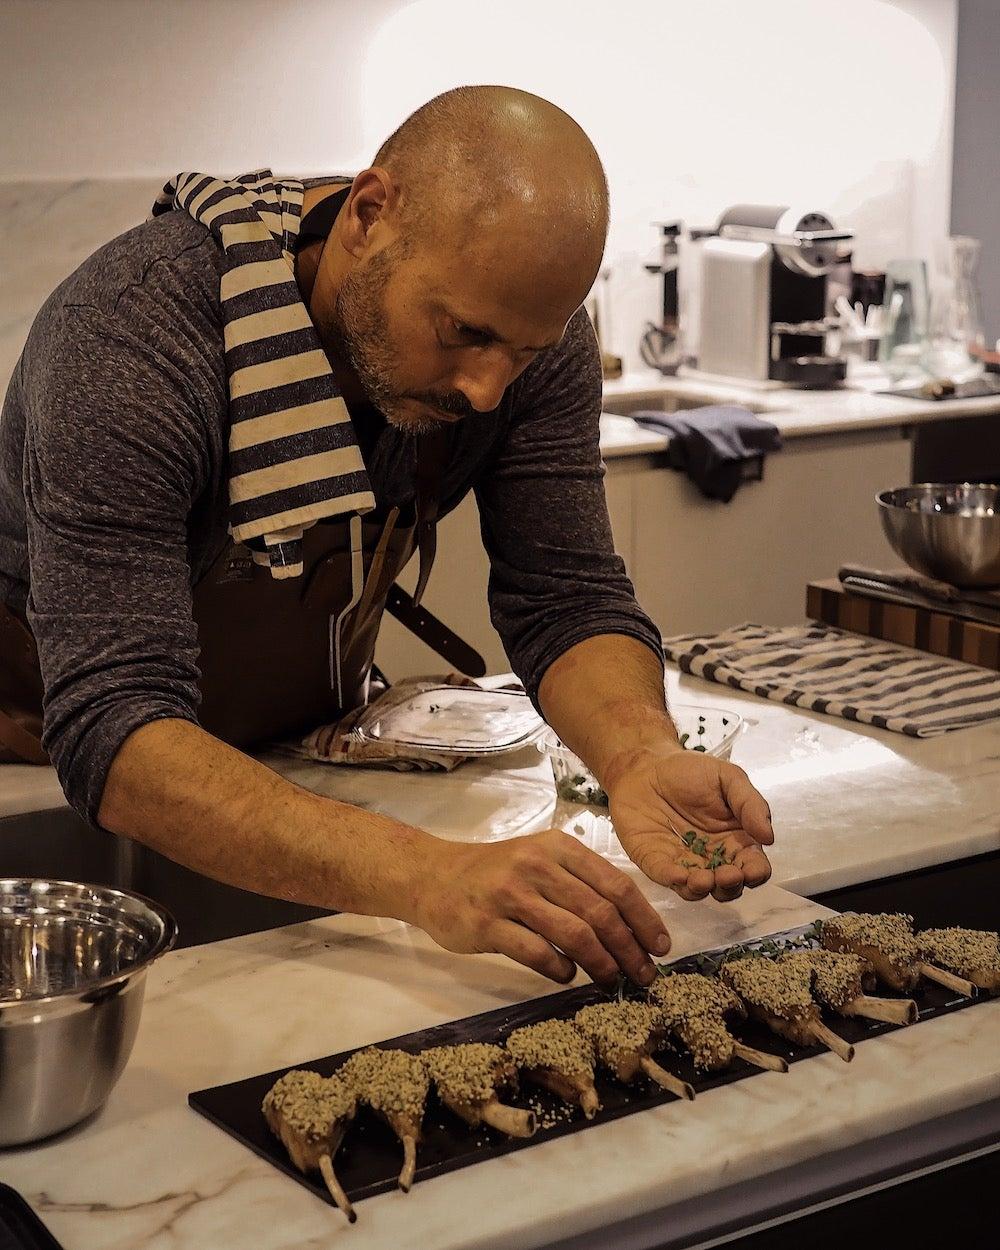 Pan-seared culottes food dinner chef jordan wagman